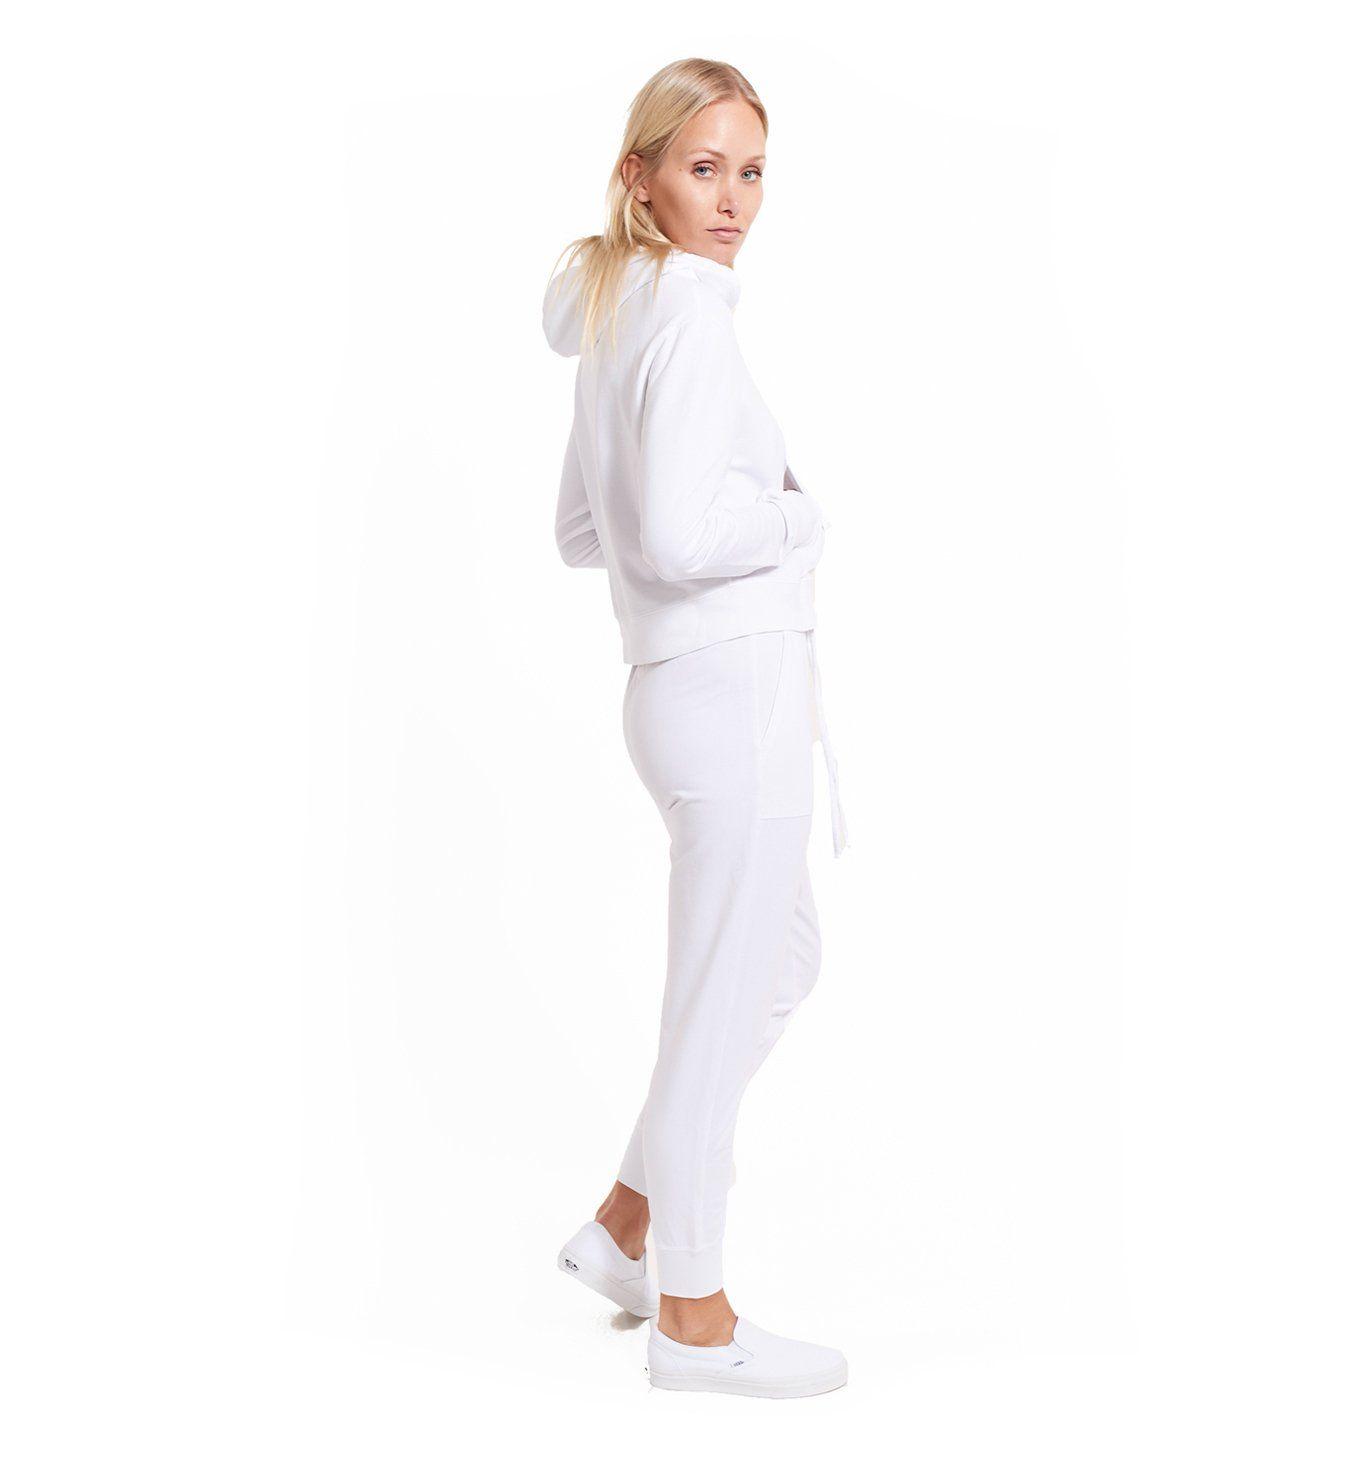 Women's Micro Terry Rib Cuff Jogger | White | Goodlife Clothing